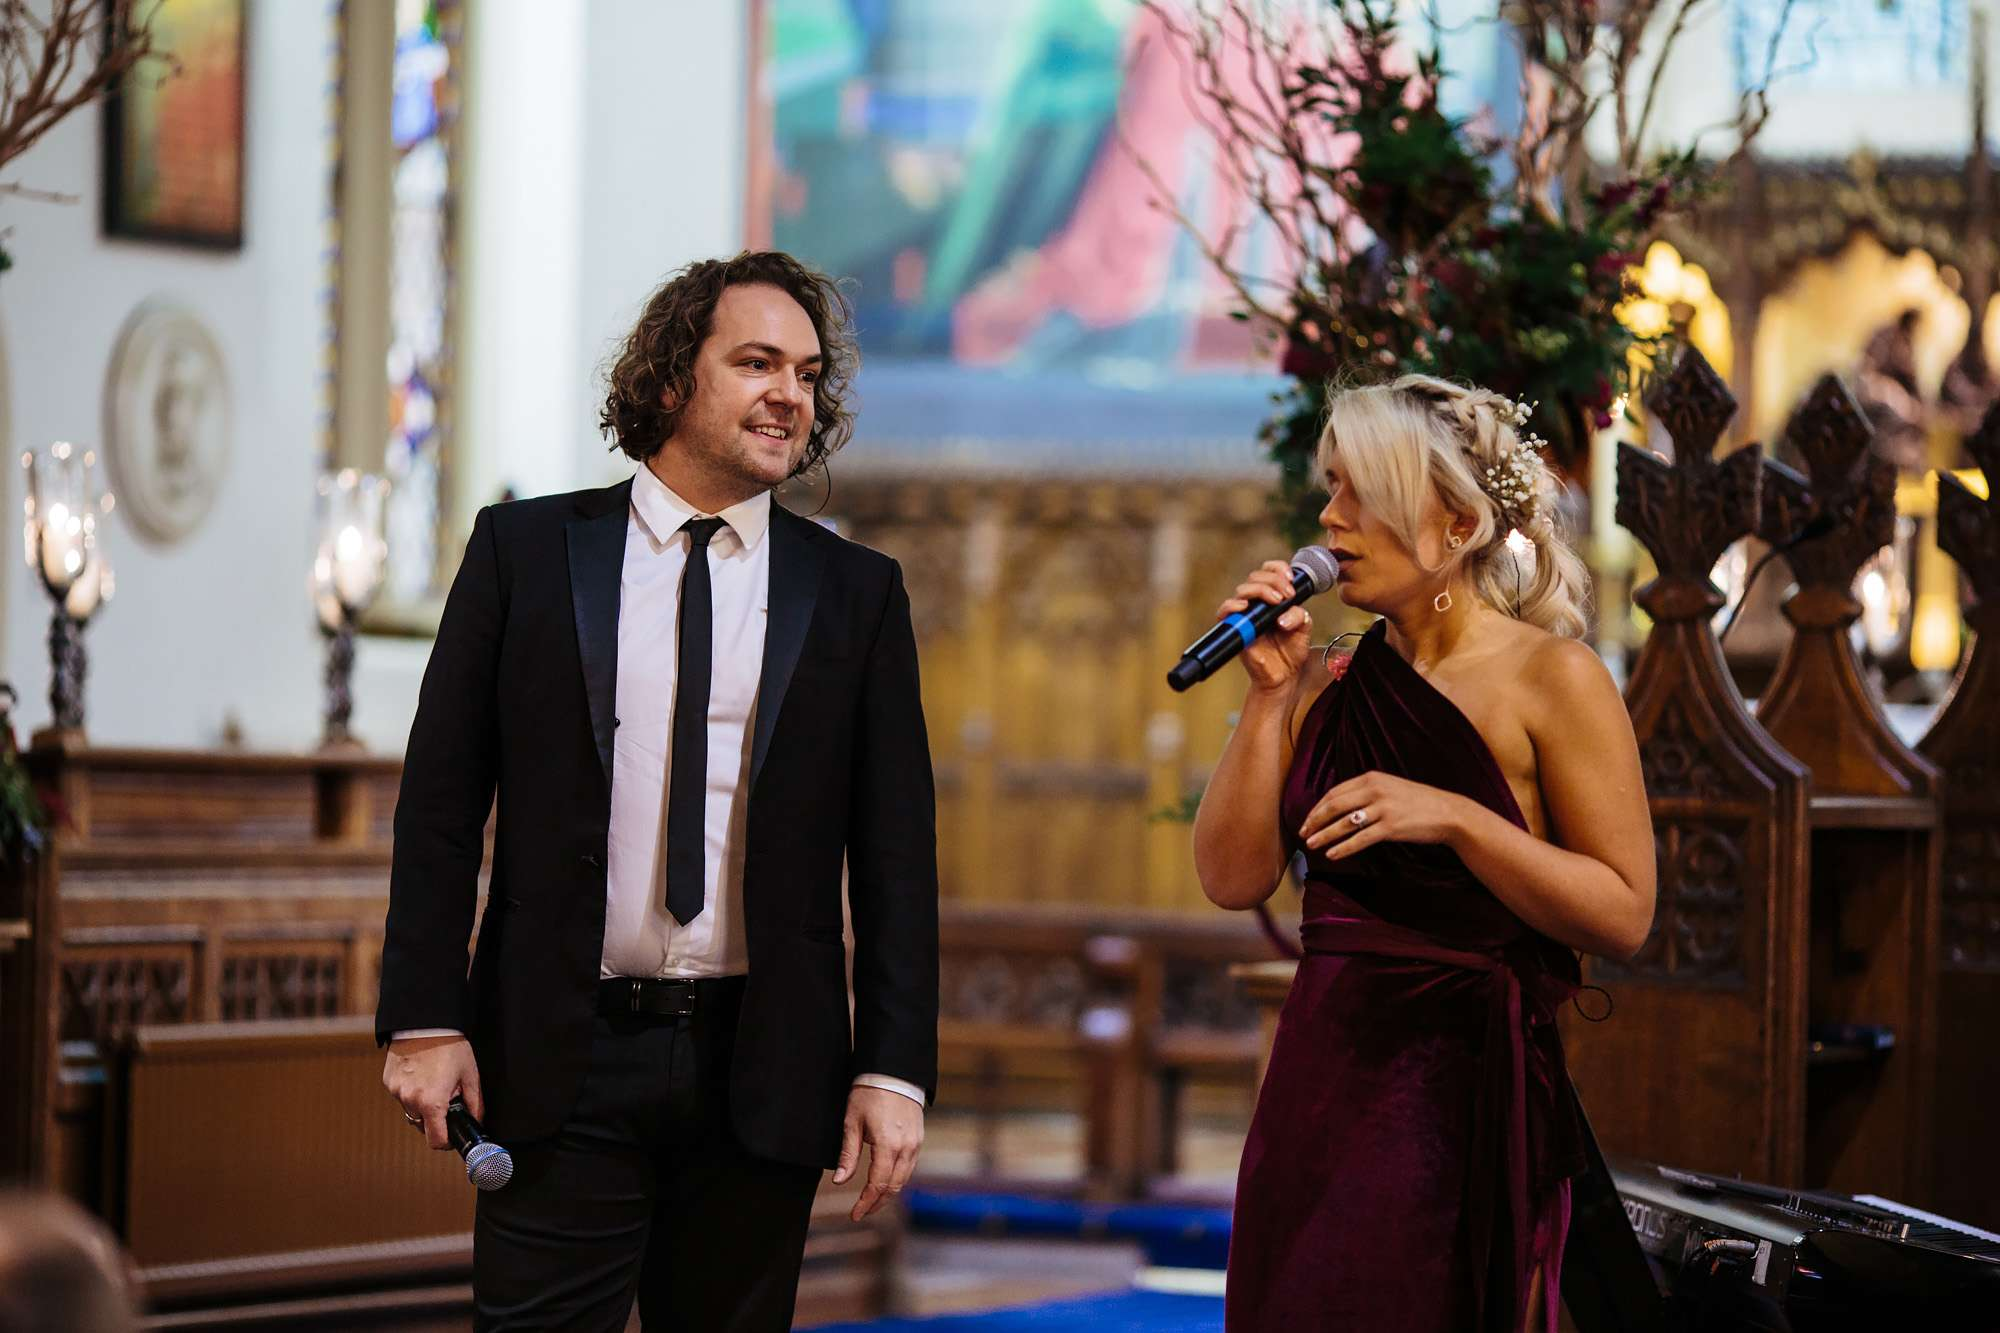 Singers at a church wedding